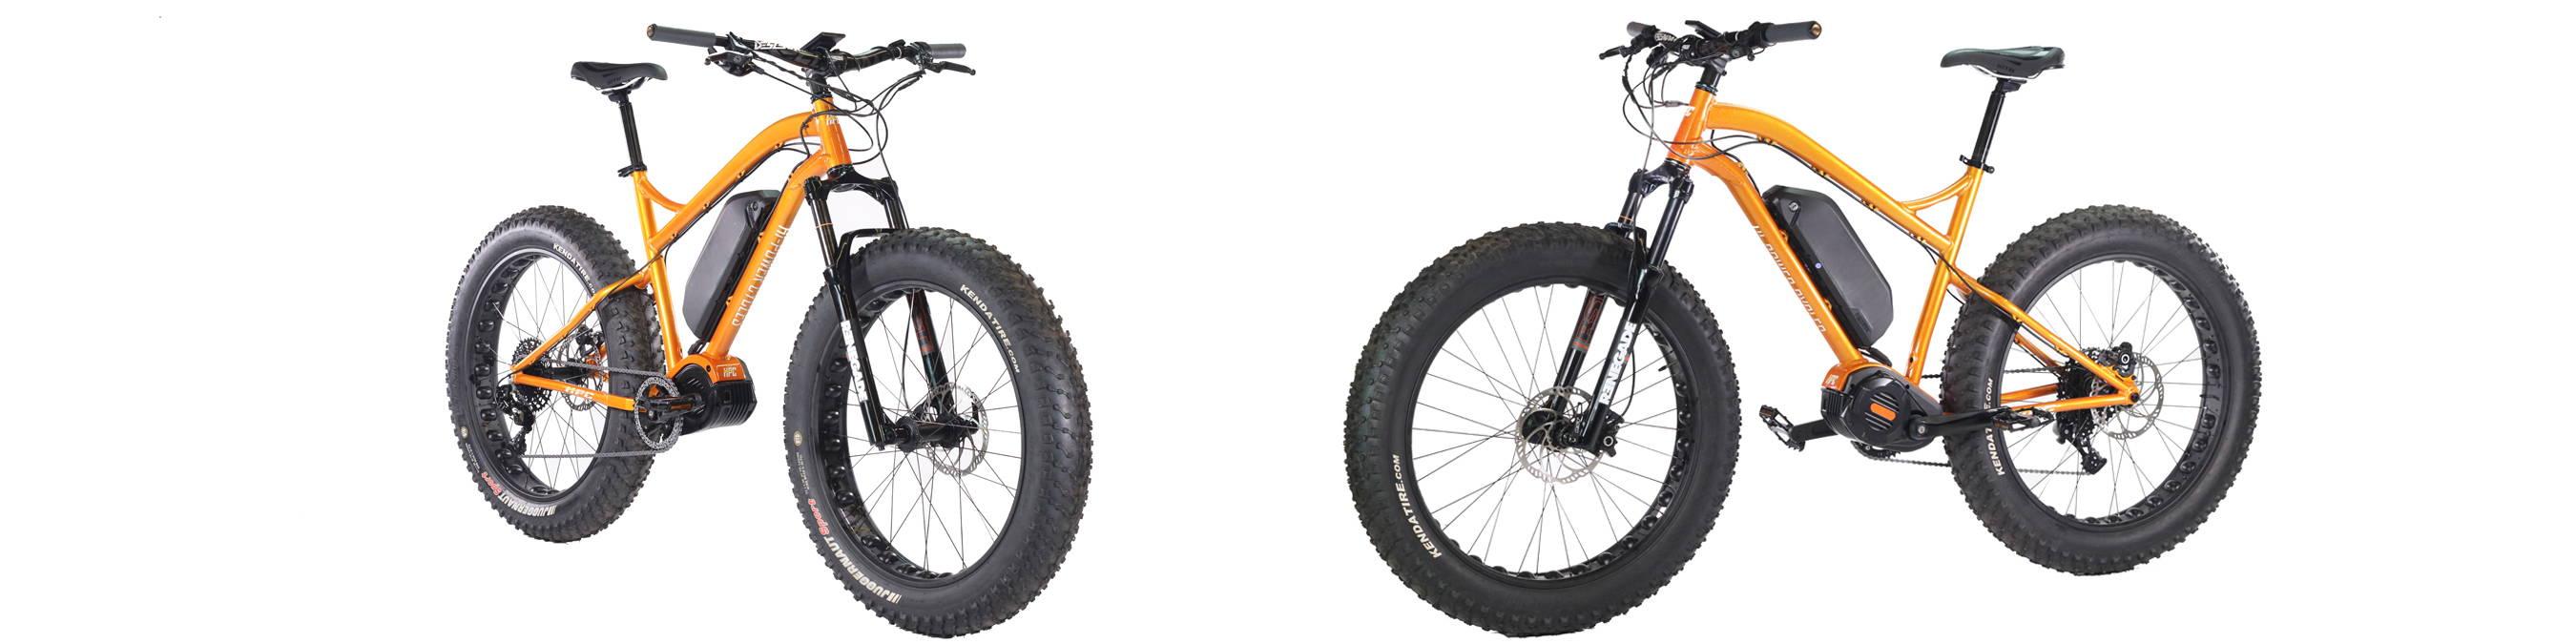 Titan High Performance Fat Tire Electric Bike | Hi Power Cycles